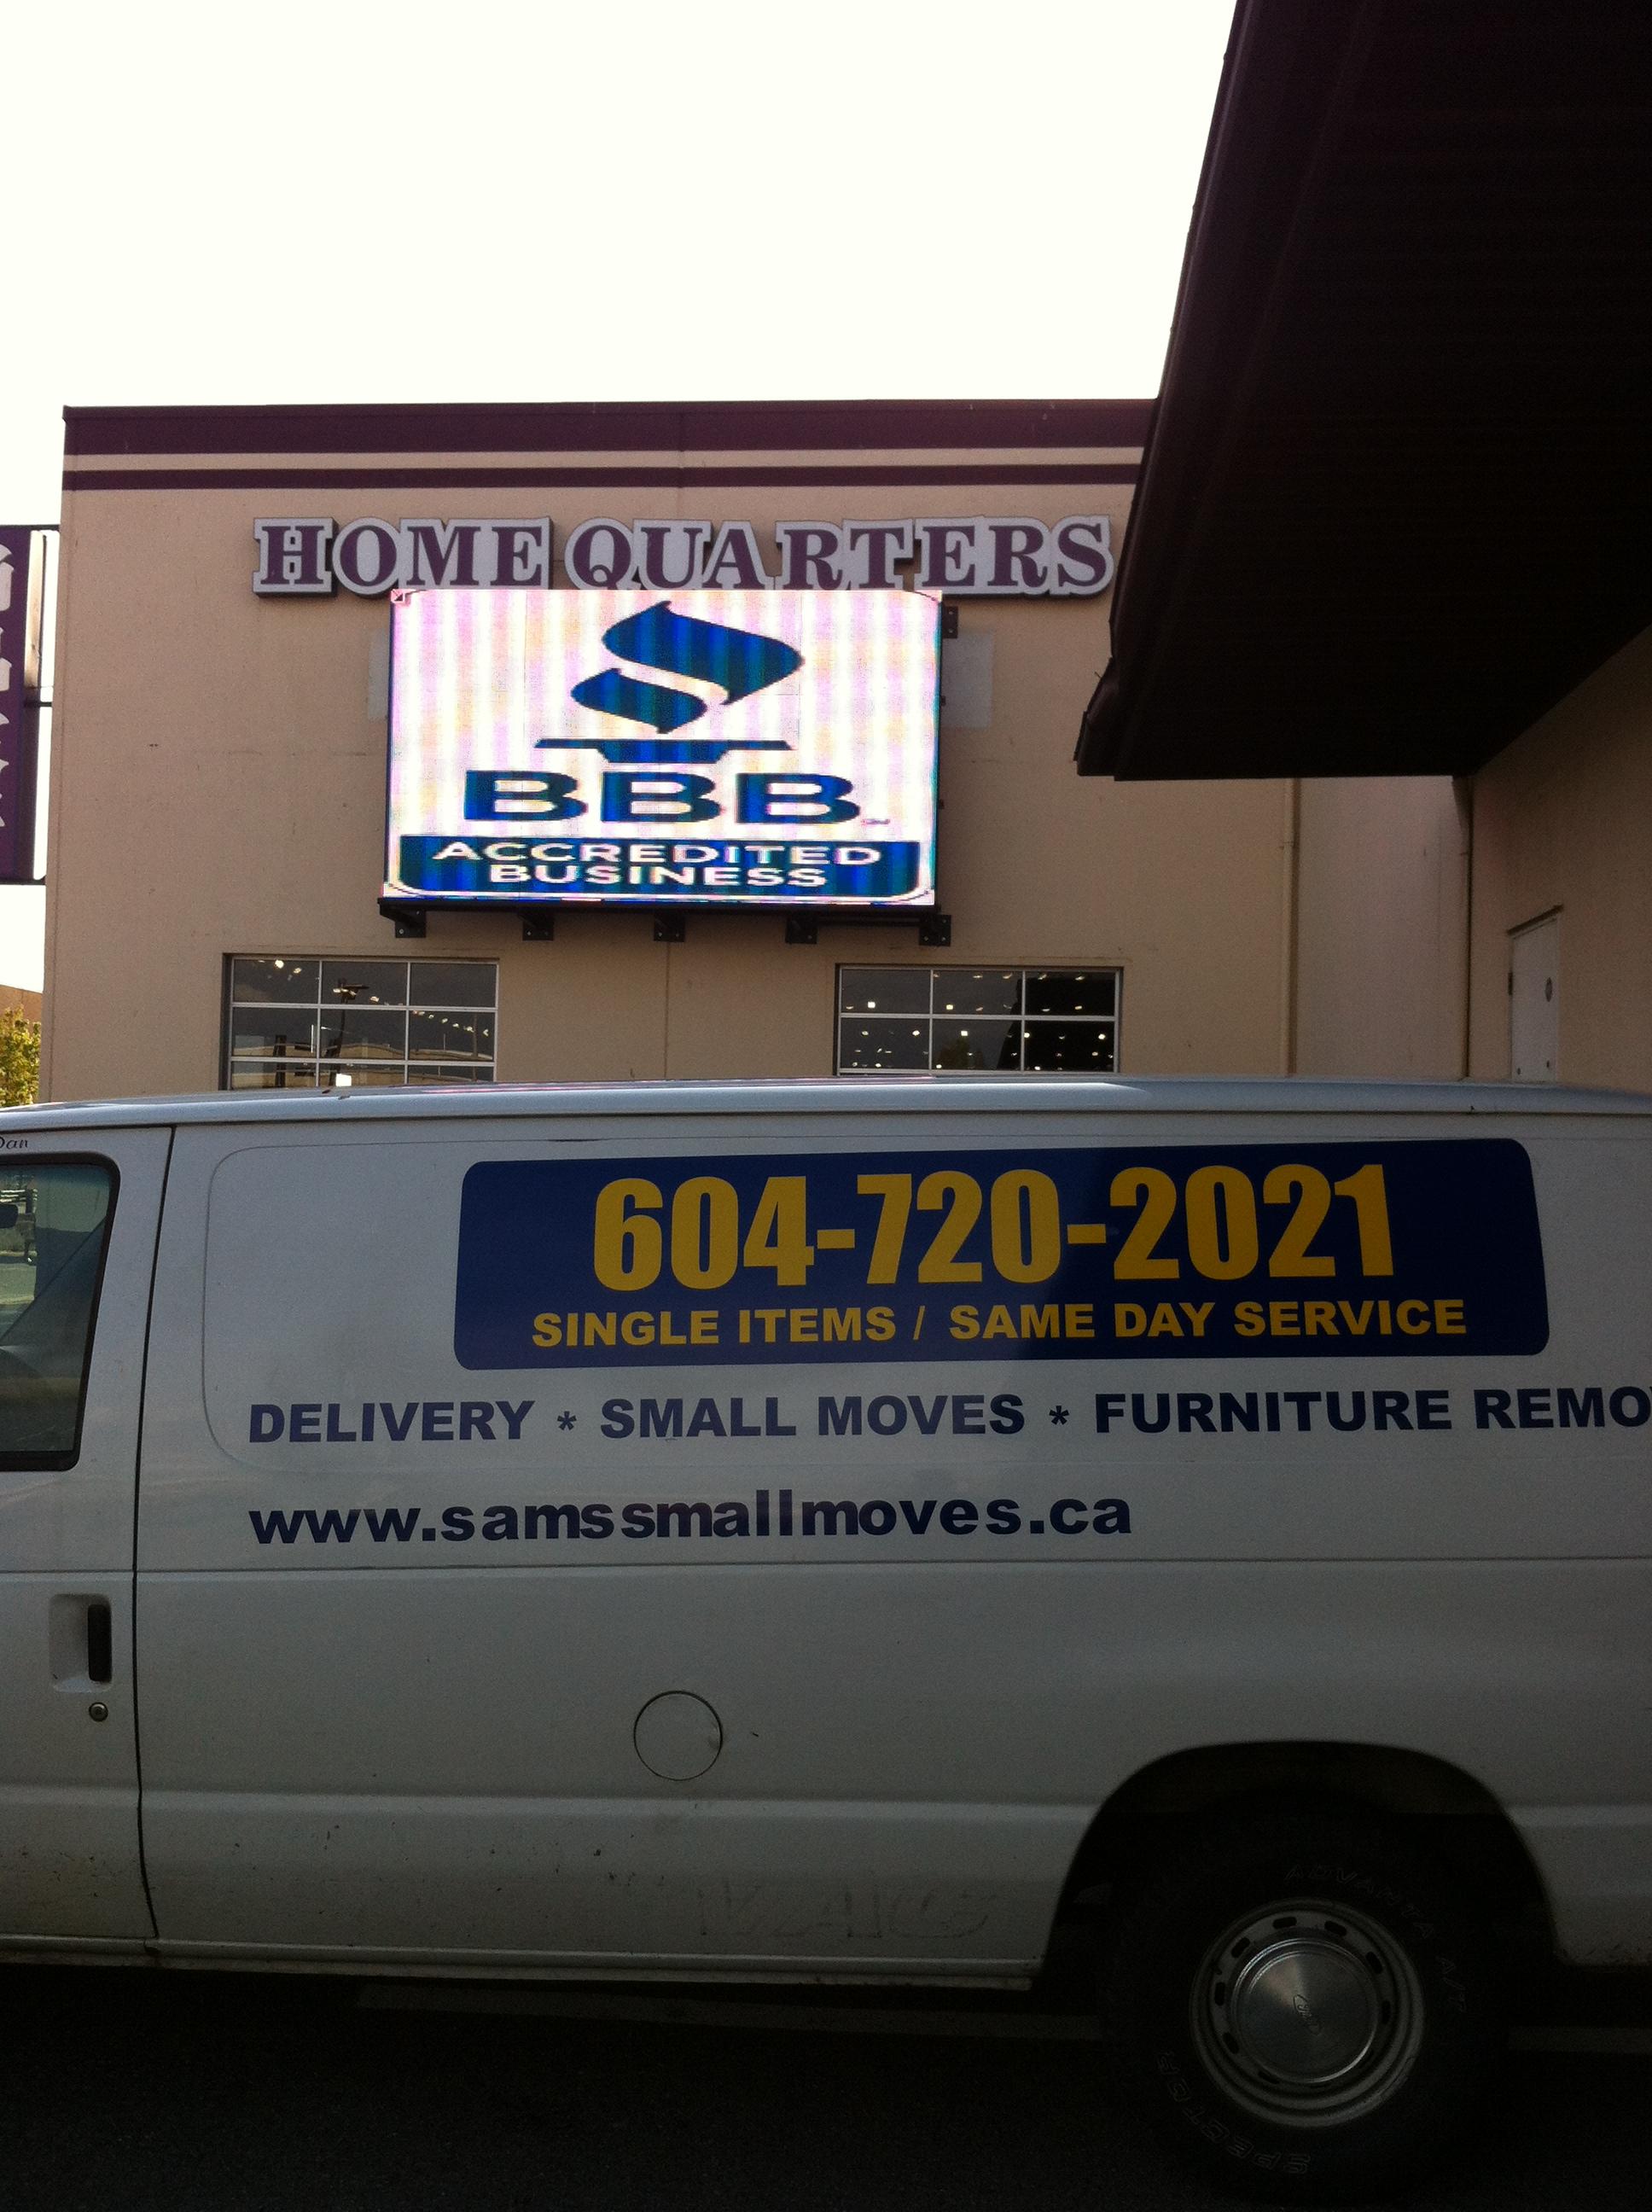 Craigslist Delivery Company Furniture Delivery Service Sam 39 S Small Moves Ltd Cheap Delivery